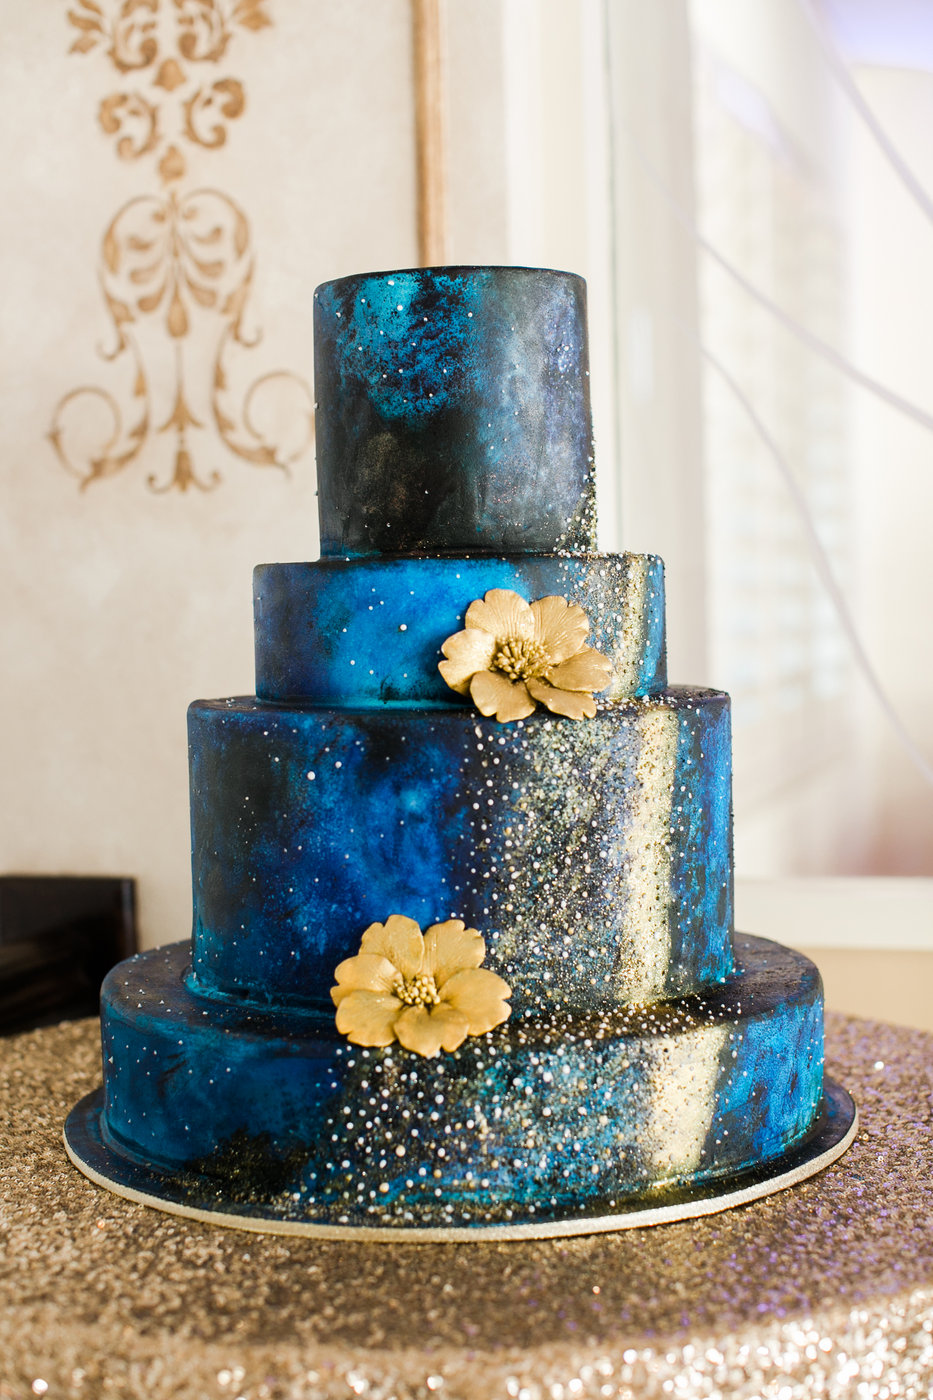 Gallery Elegant Cakes E And E Special Events